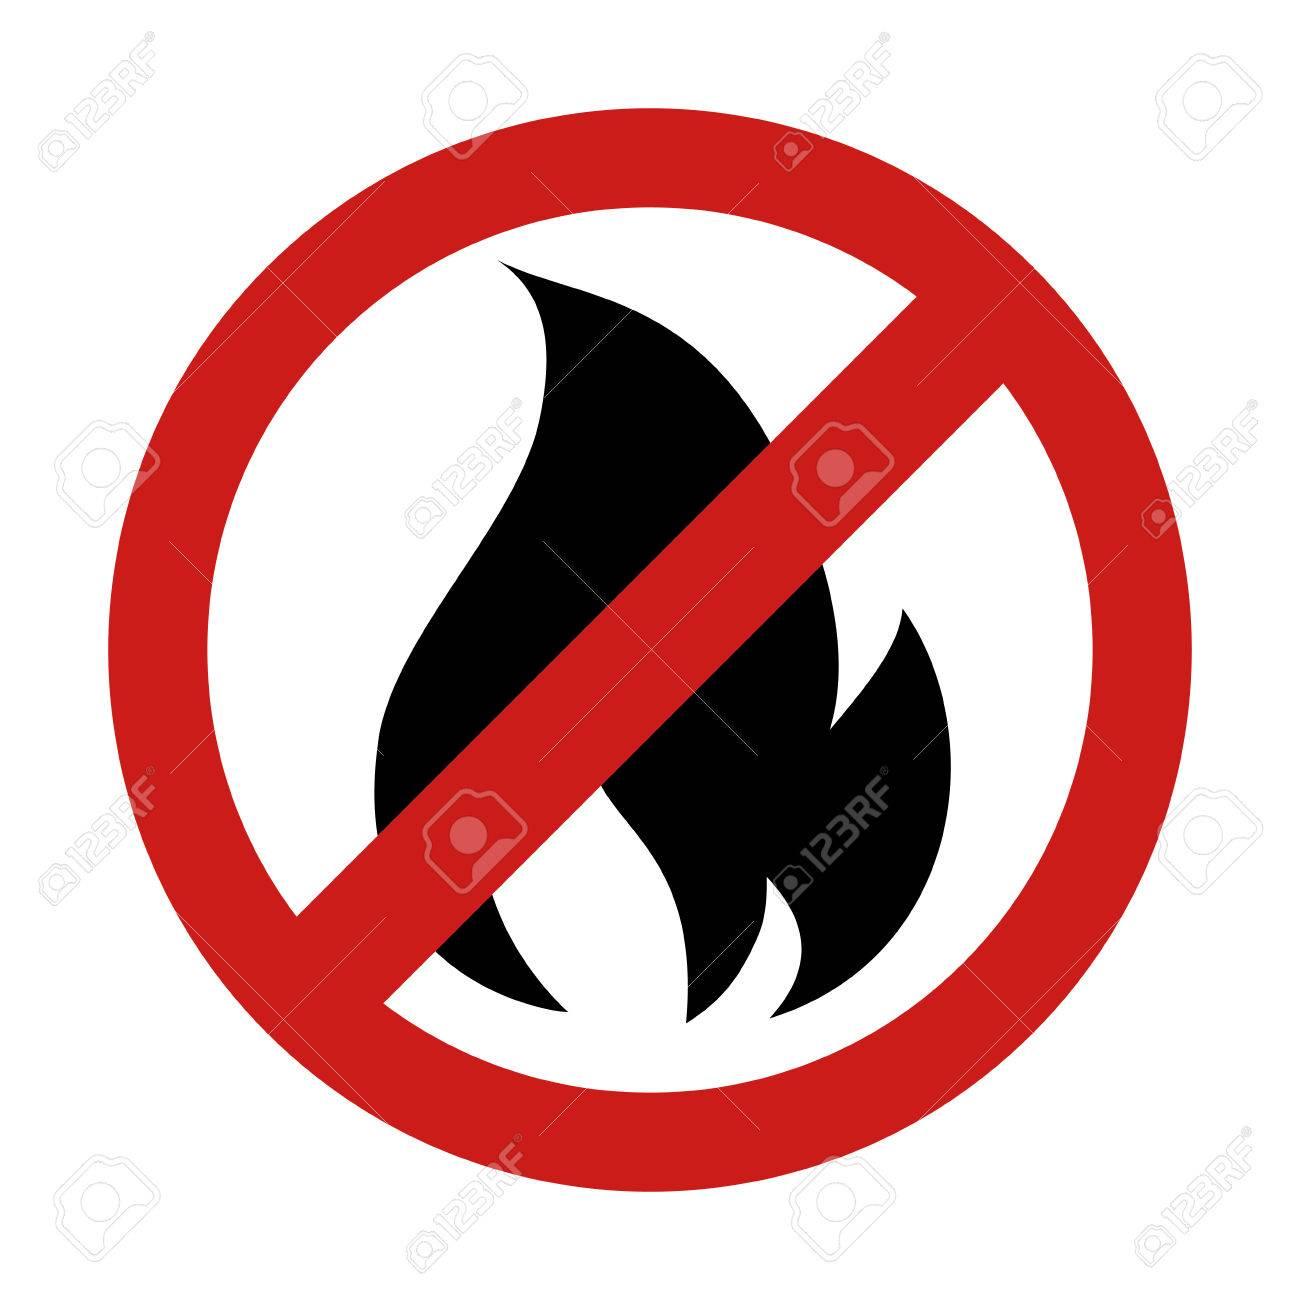 Forbidden flame fire sign flammable danger warning burn vector forbidden flame fire sign flammable danger warning burn vector graphic isolated illustration stock vector 61126133 buycottarizona